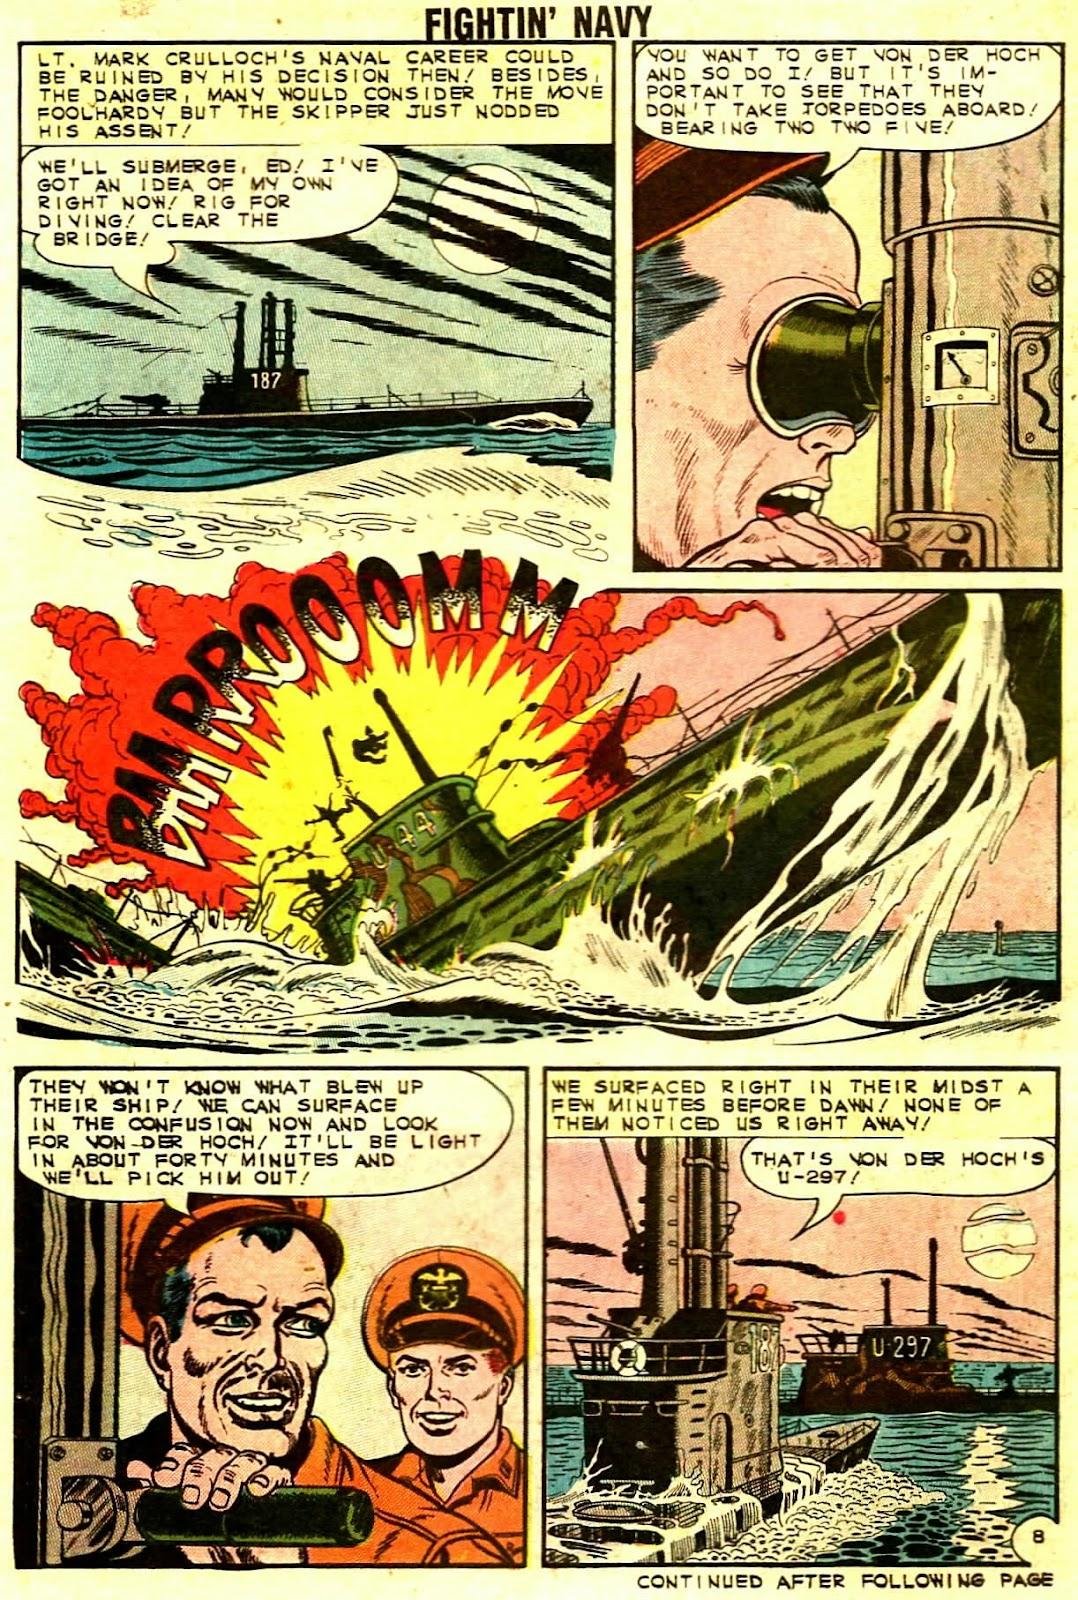 Read online Fightin' Navy comic -  Issue #109 - 30